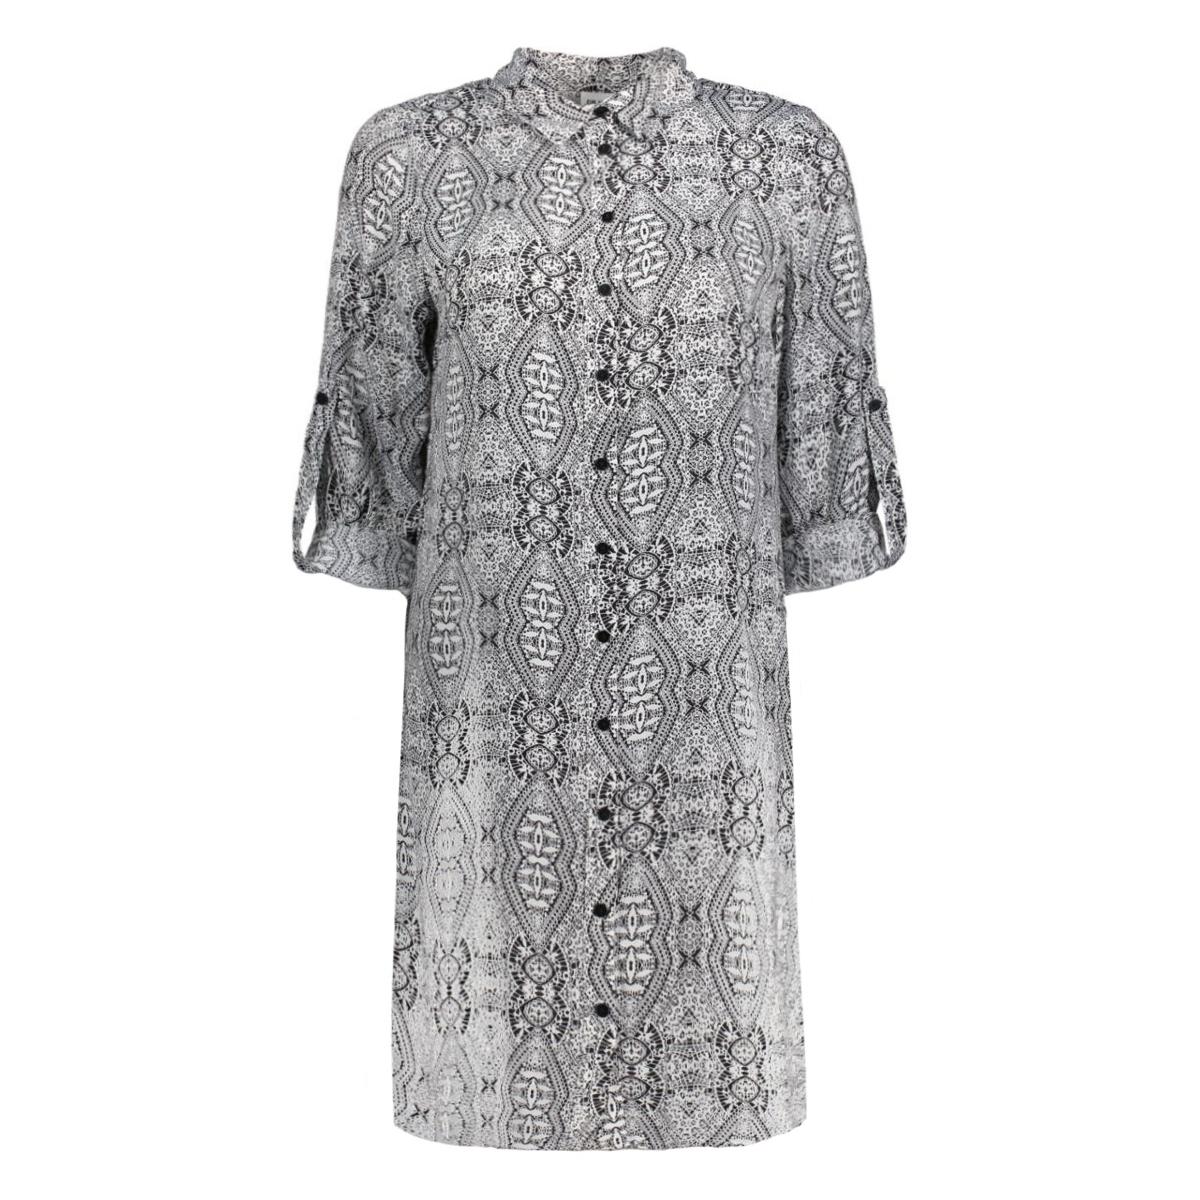 objhaik l/s long shirt 23023412 object blouse anthracite